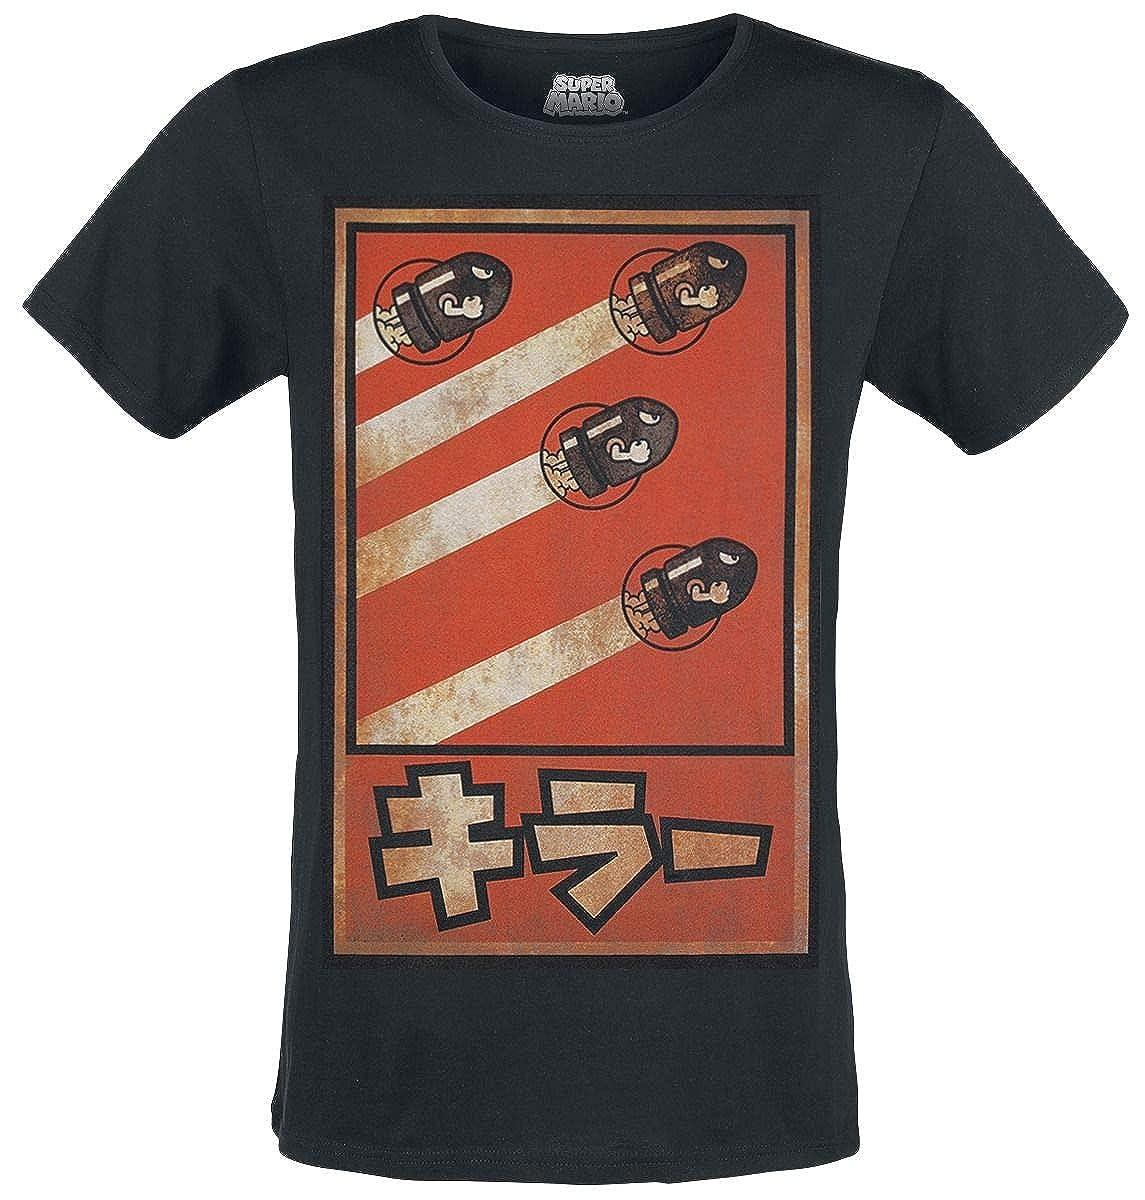 Super Mario Herren T-Shirt Kugelwilli Bullet Bill Propaganda Poster Baumwolle Schwarz